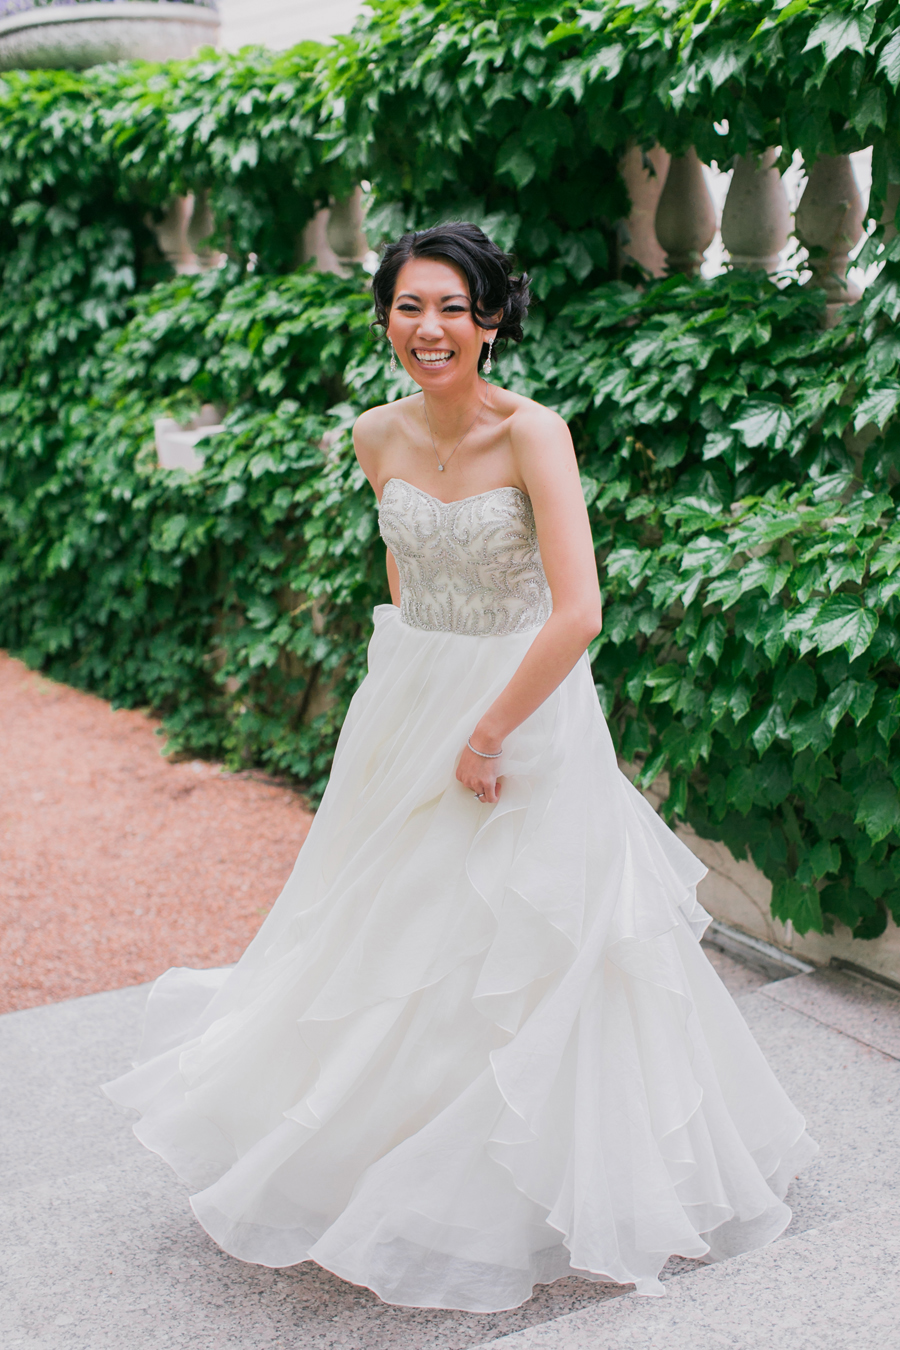 artistrie-co-best-wedding-photos-2015-014